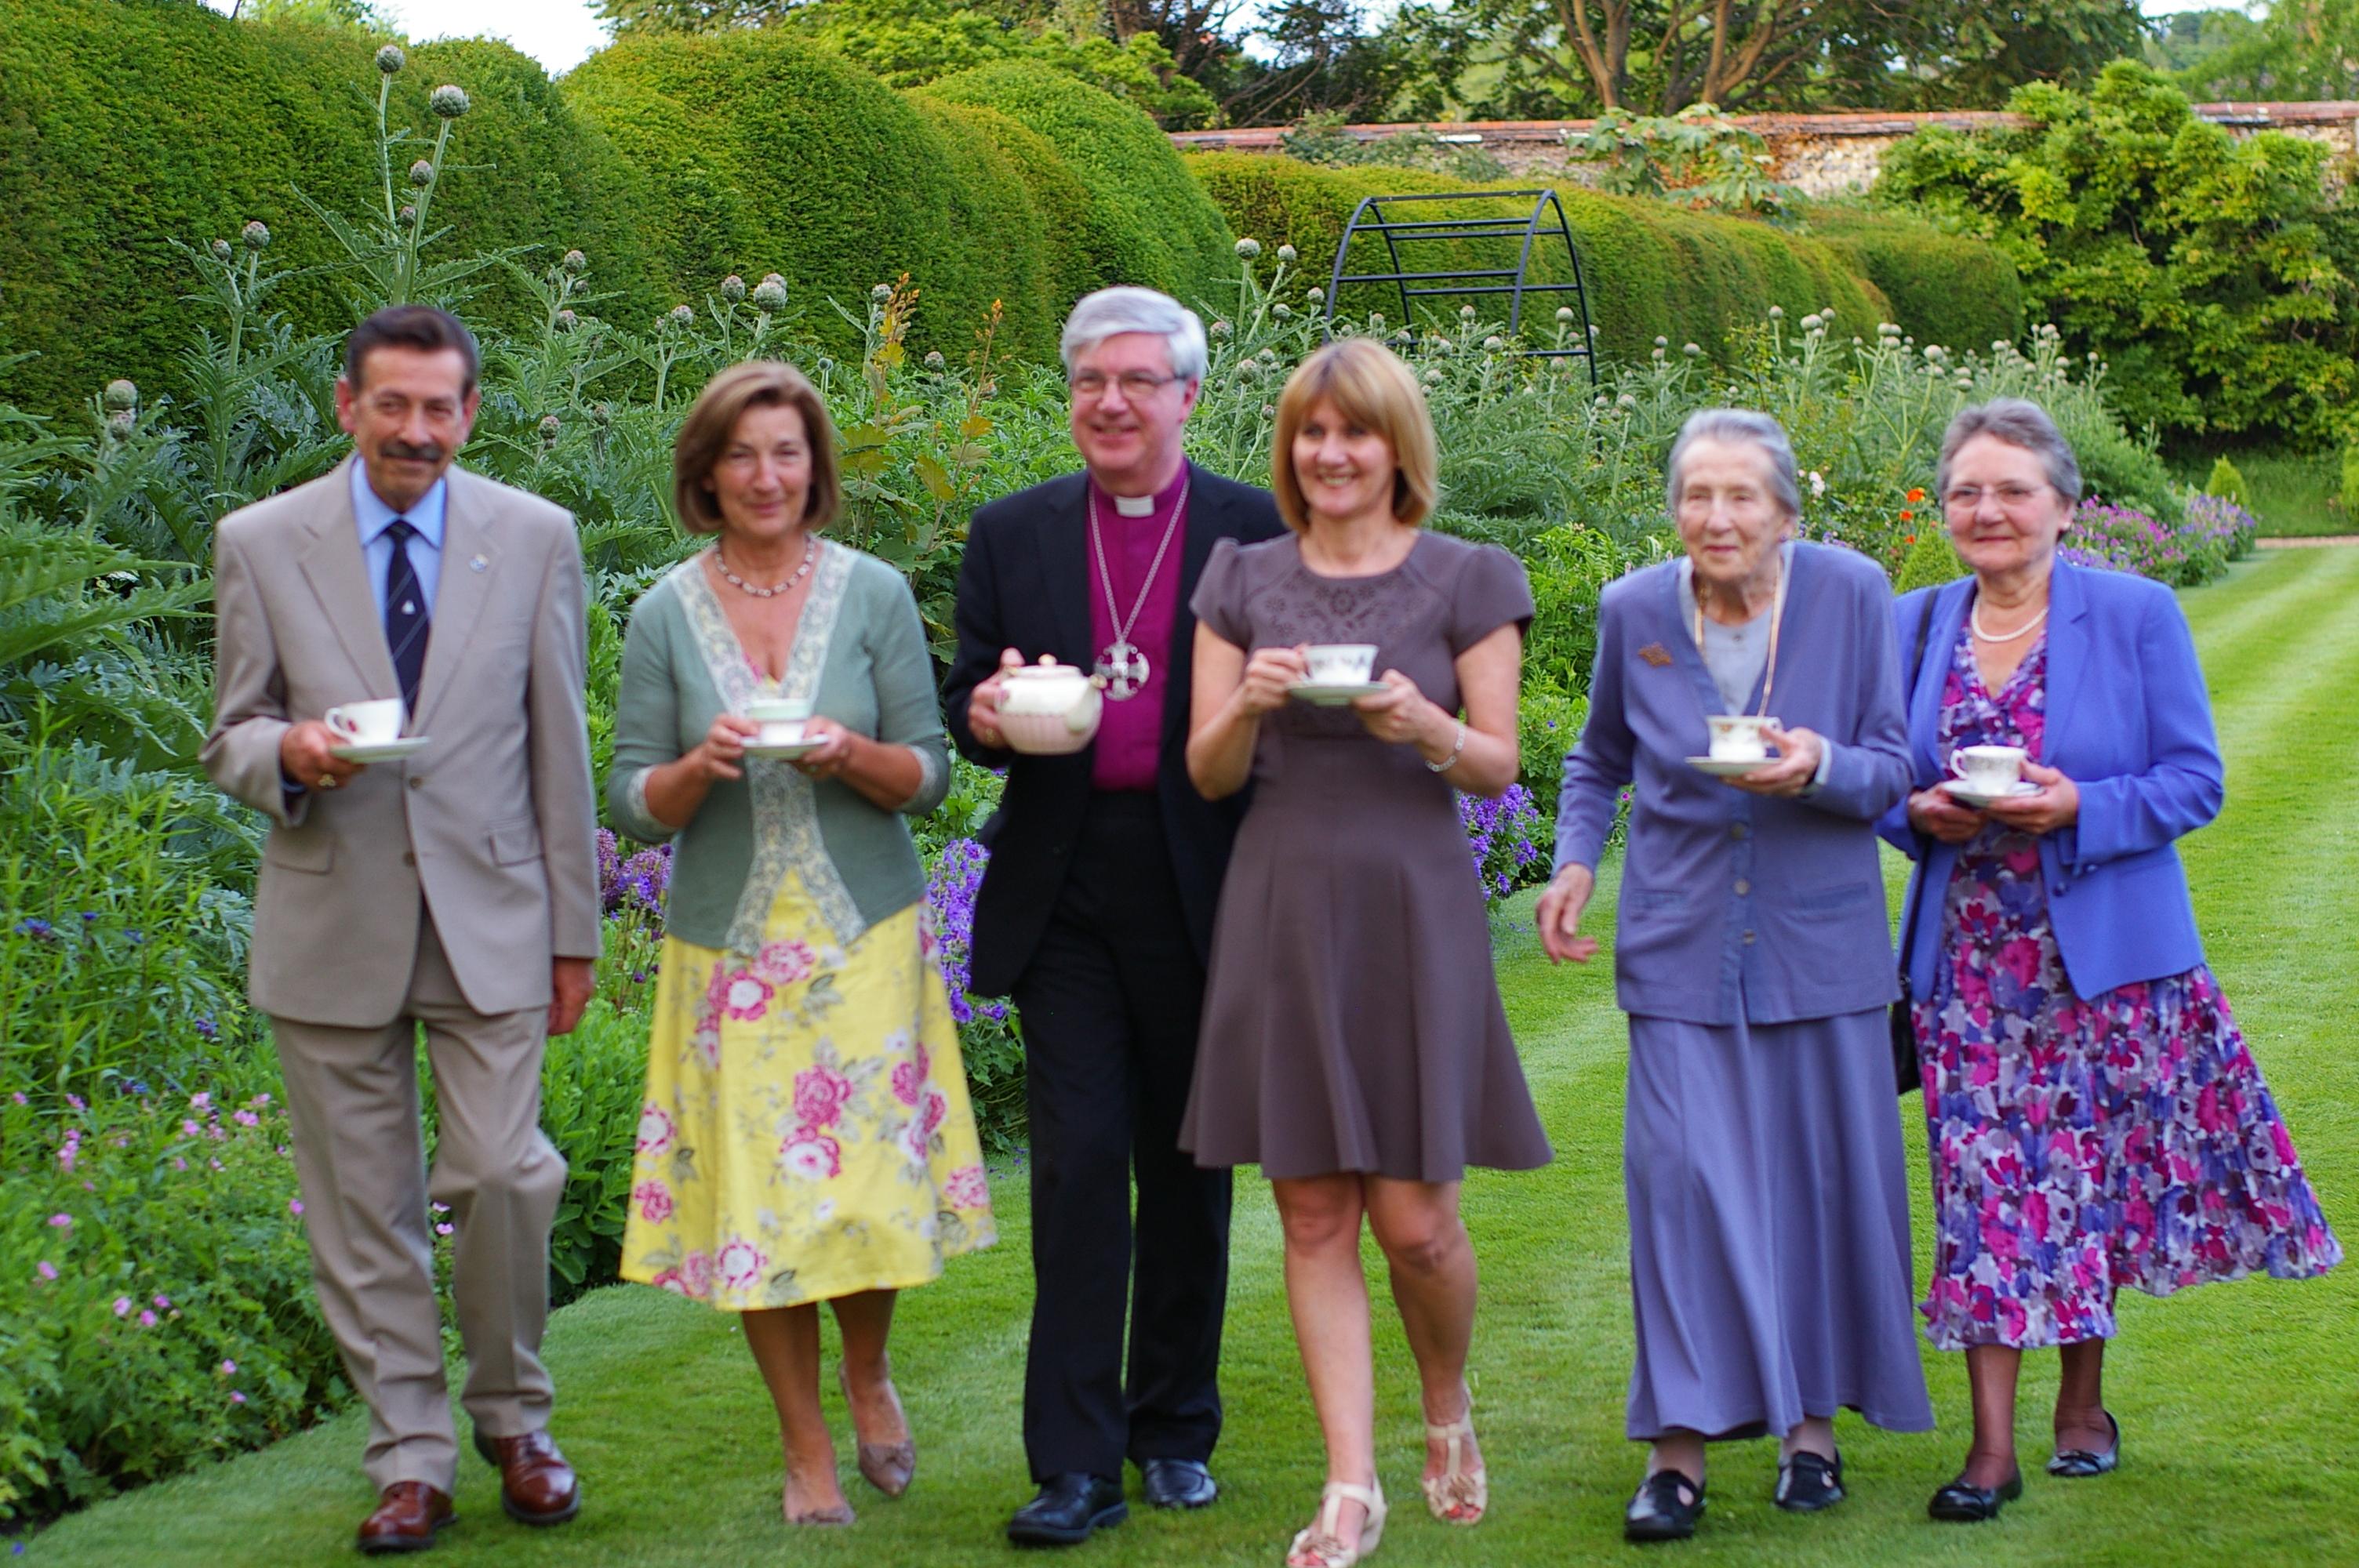 Norwich Charity Celebrates 20 Years